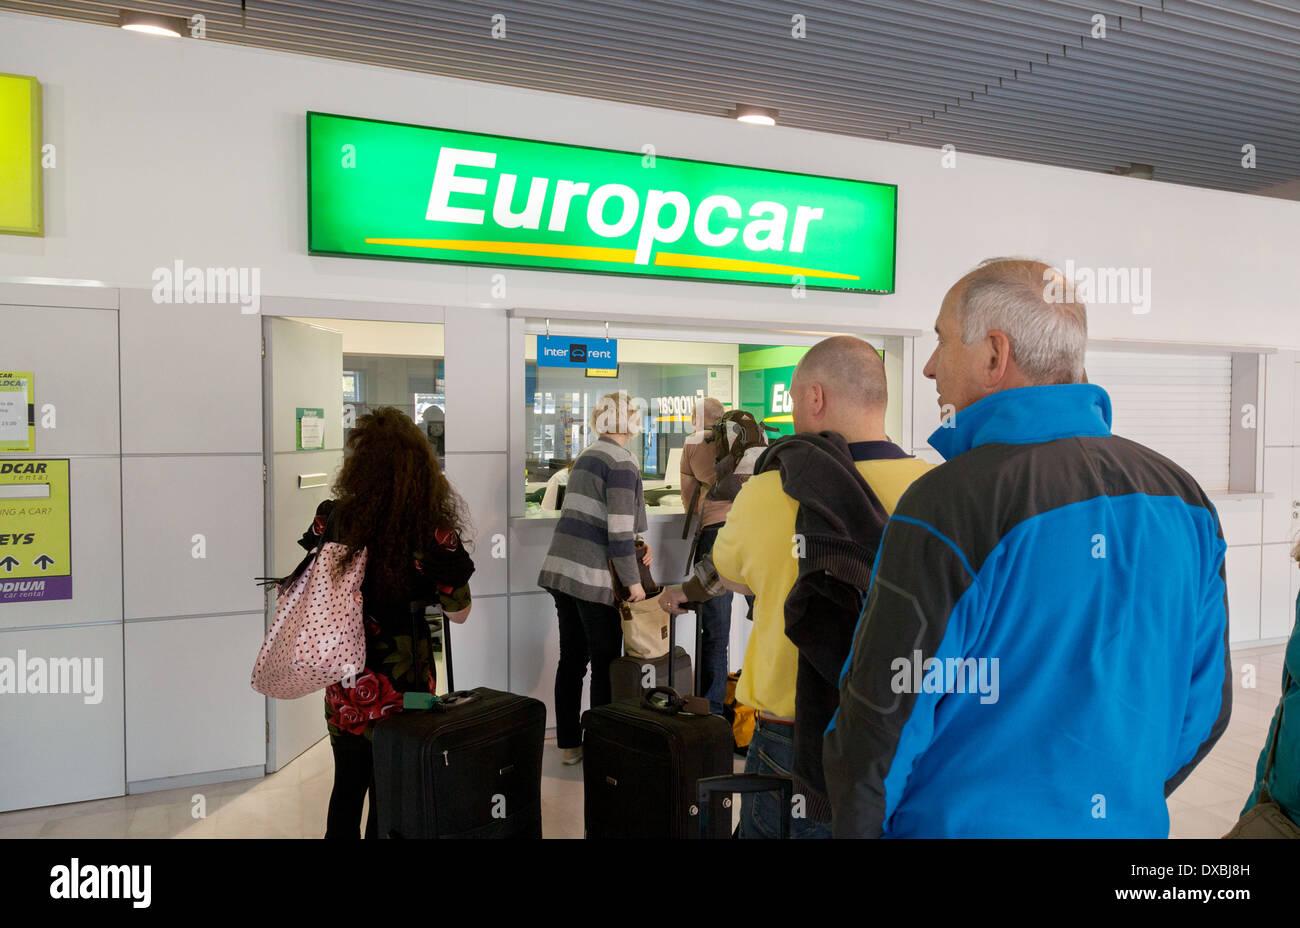 europcar stockfotos europcar bilder alamy. Black Bedroom Furniture Sets. Home Design Ideas